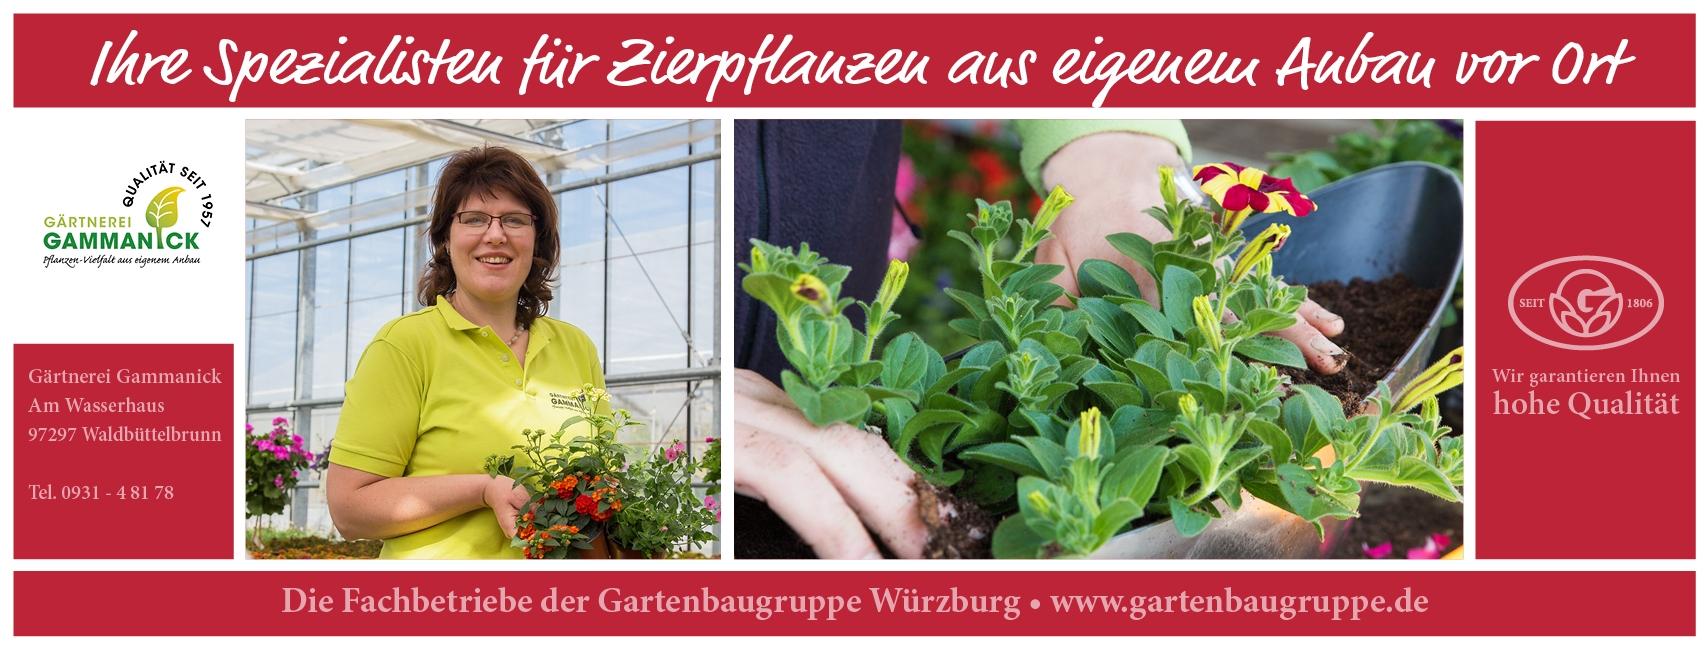 Gärtnerei Gammanick - Gartenbaugruppe Würzburg